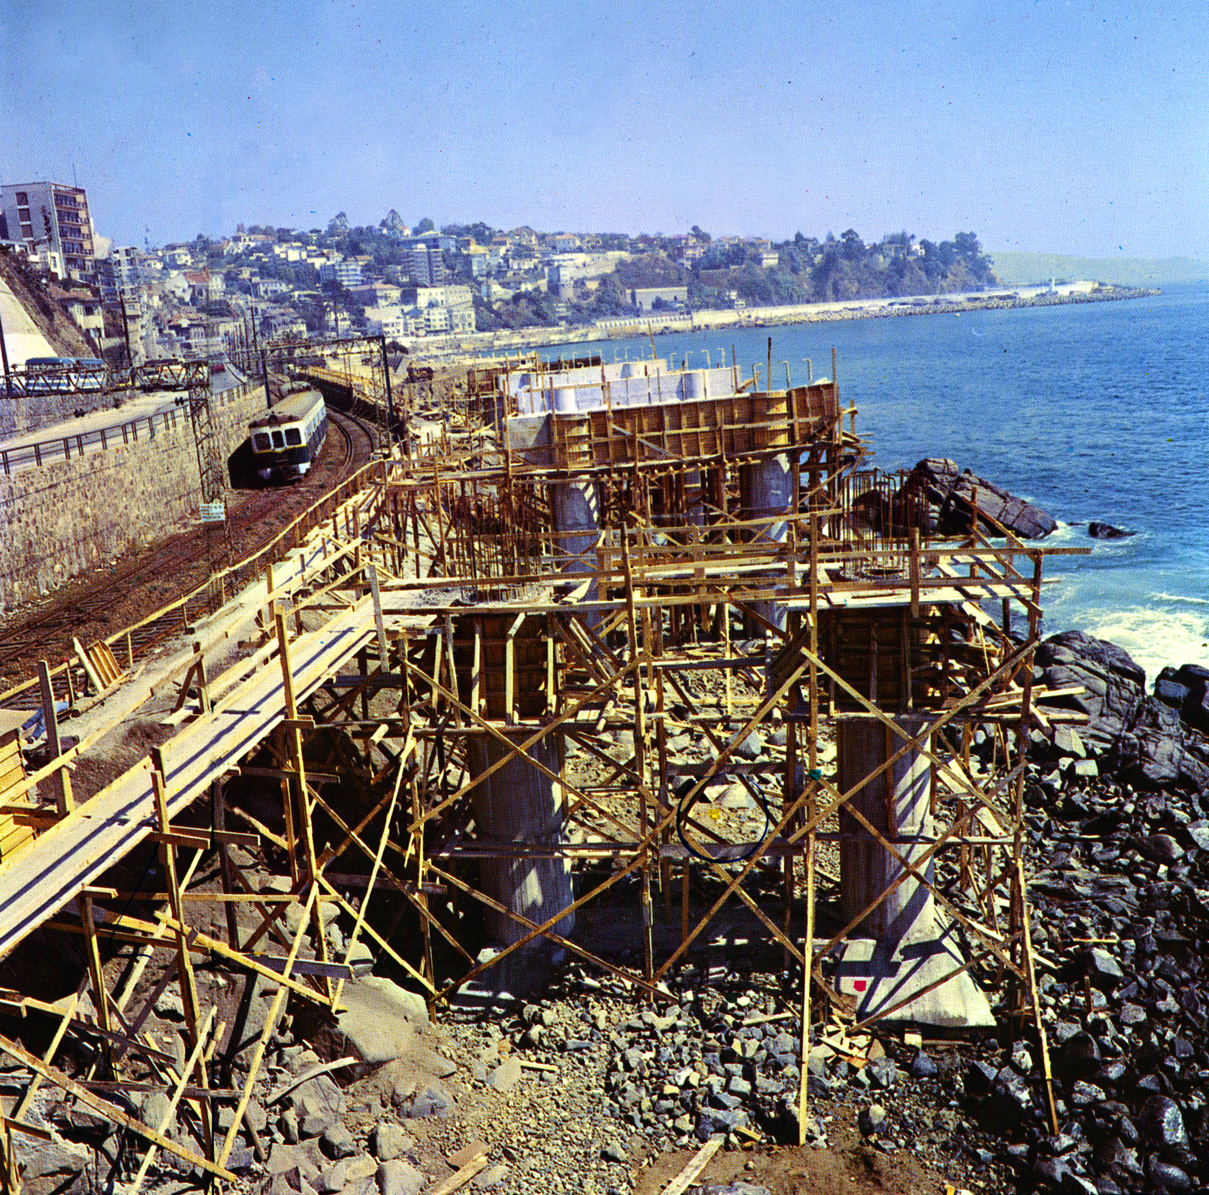 Enterreno - Fotos históricas de chile - fotos antiguas de Chile - Ampliación de avenida España, Puente Capuchinos, 1984